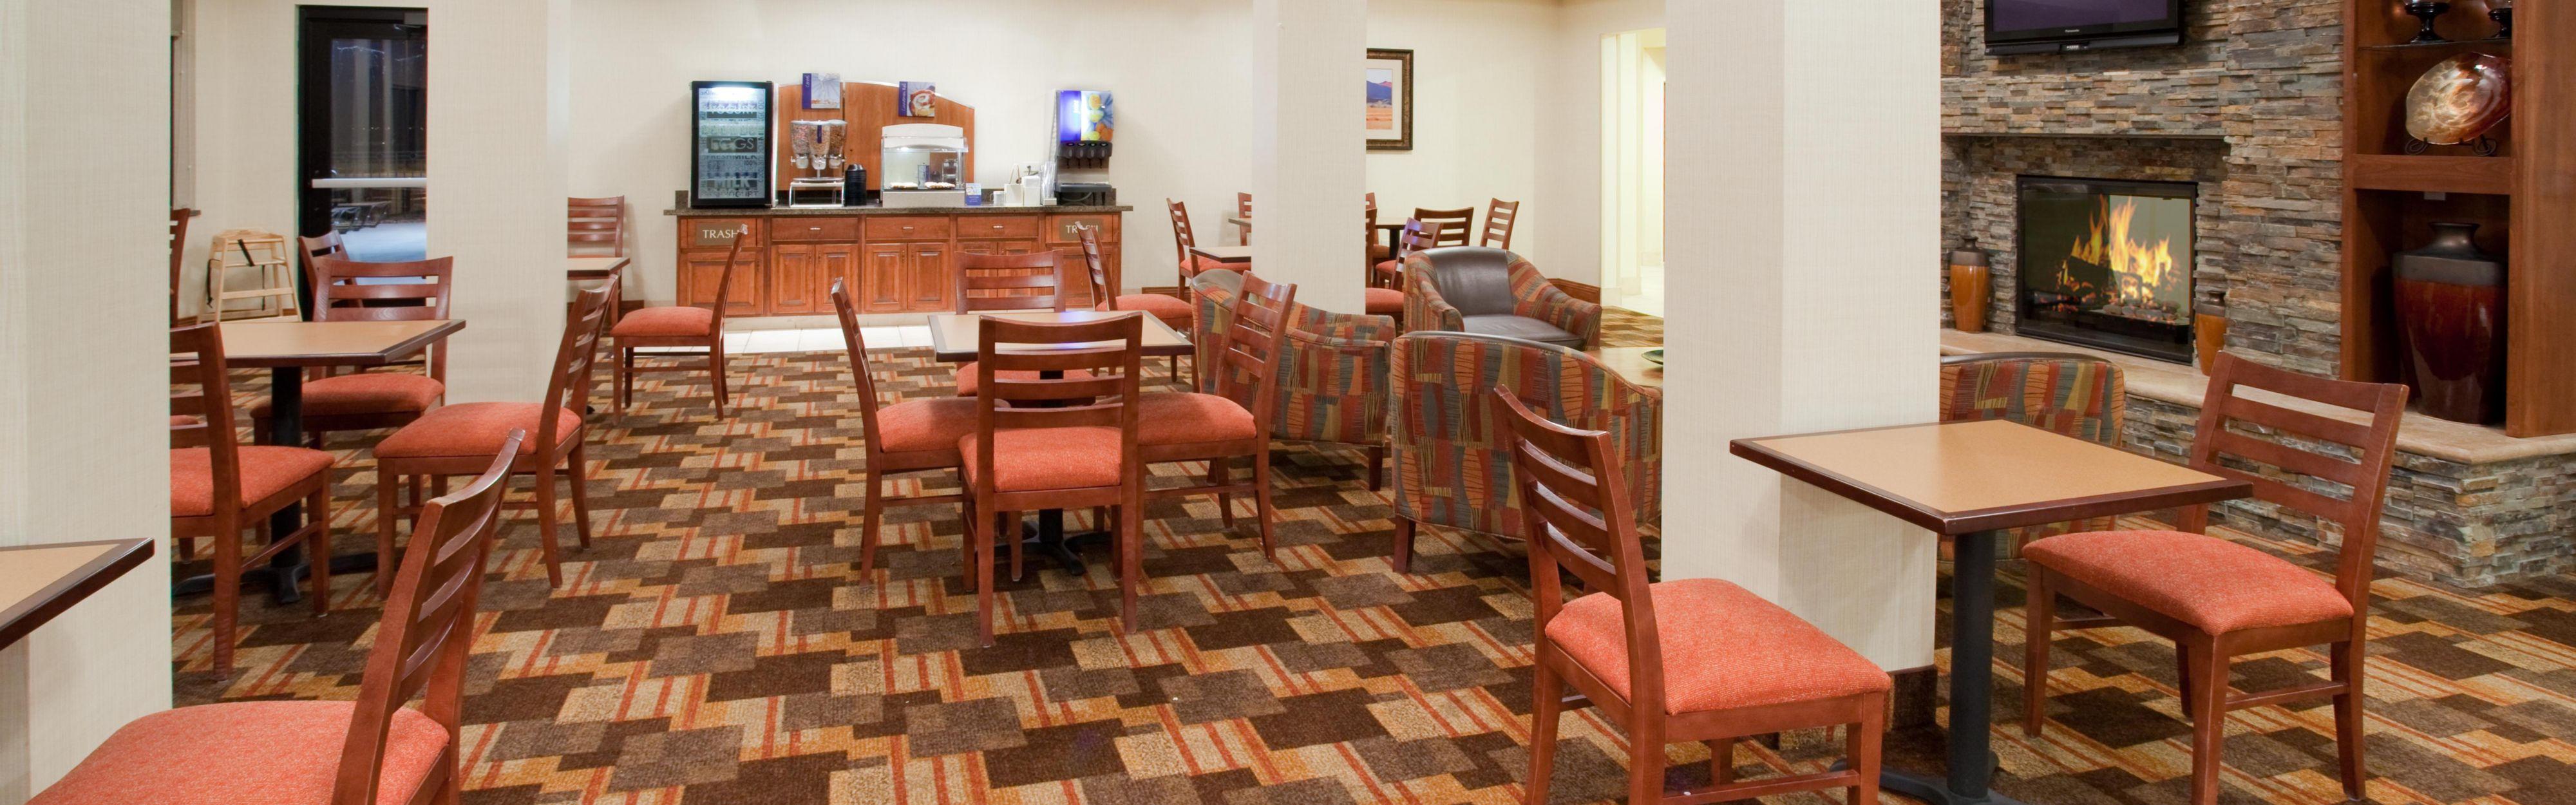 Holiday Inn Express & Suites Loveland image 2